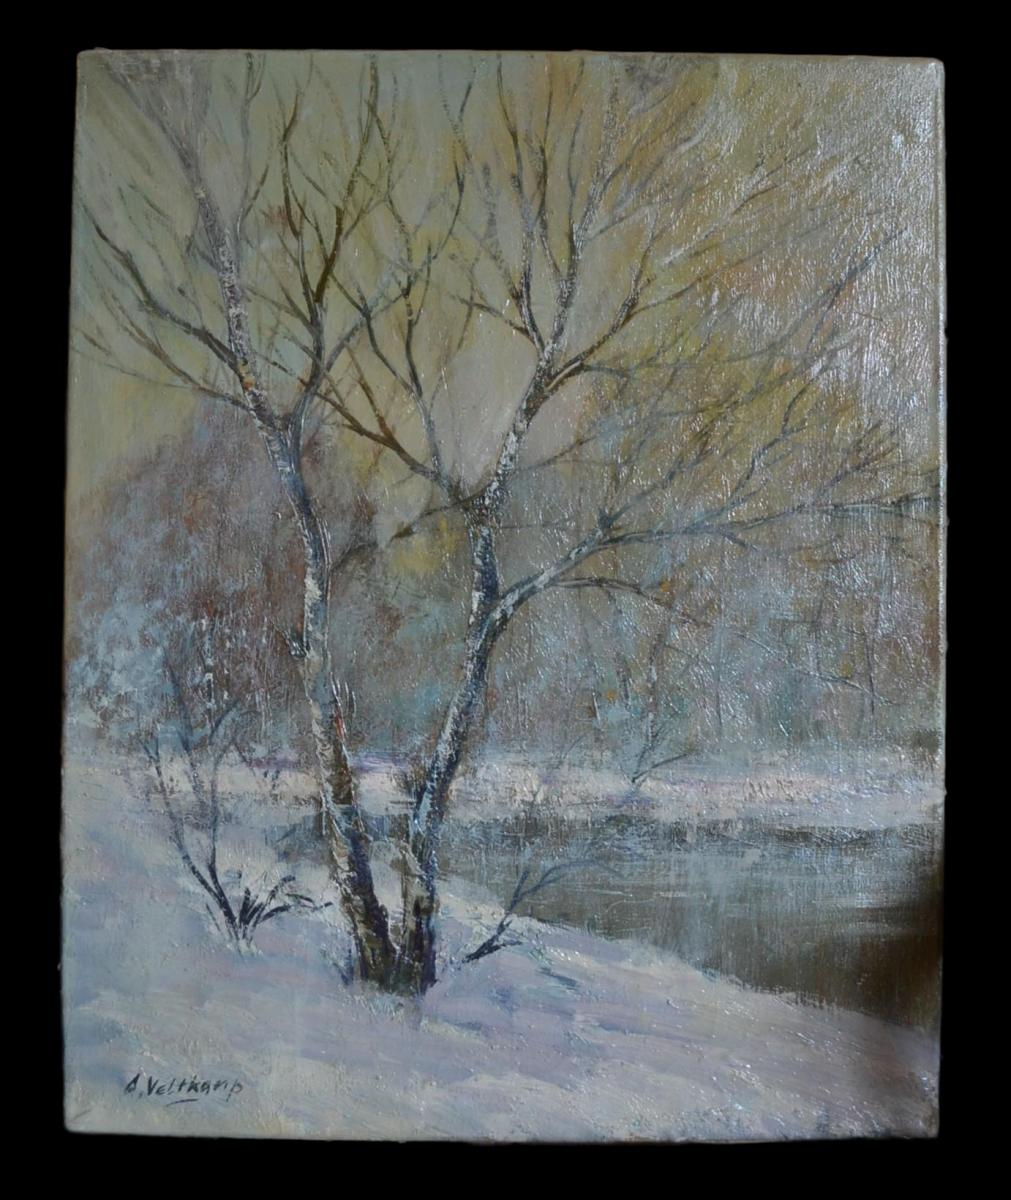 A. Veltkamp - Winter - Circa 1950